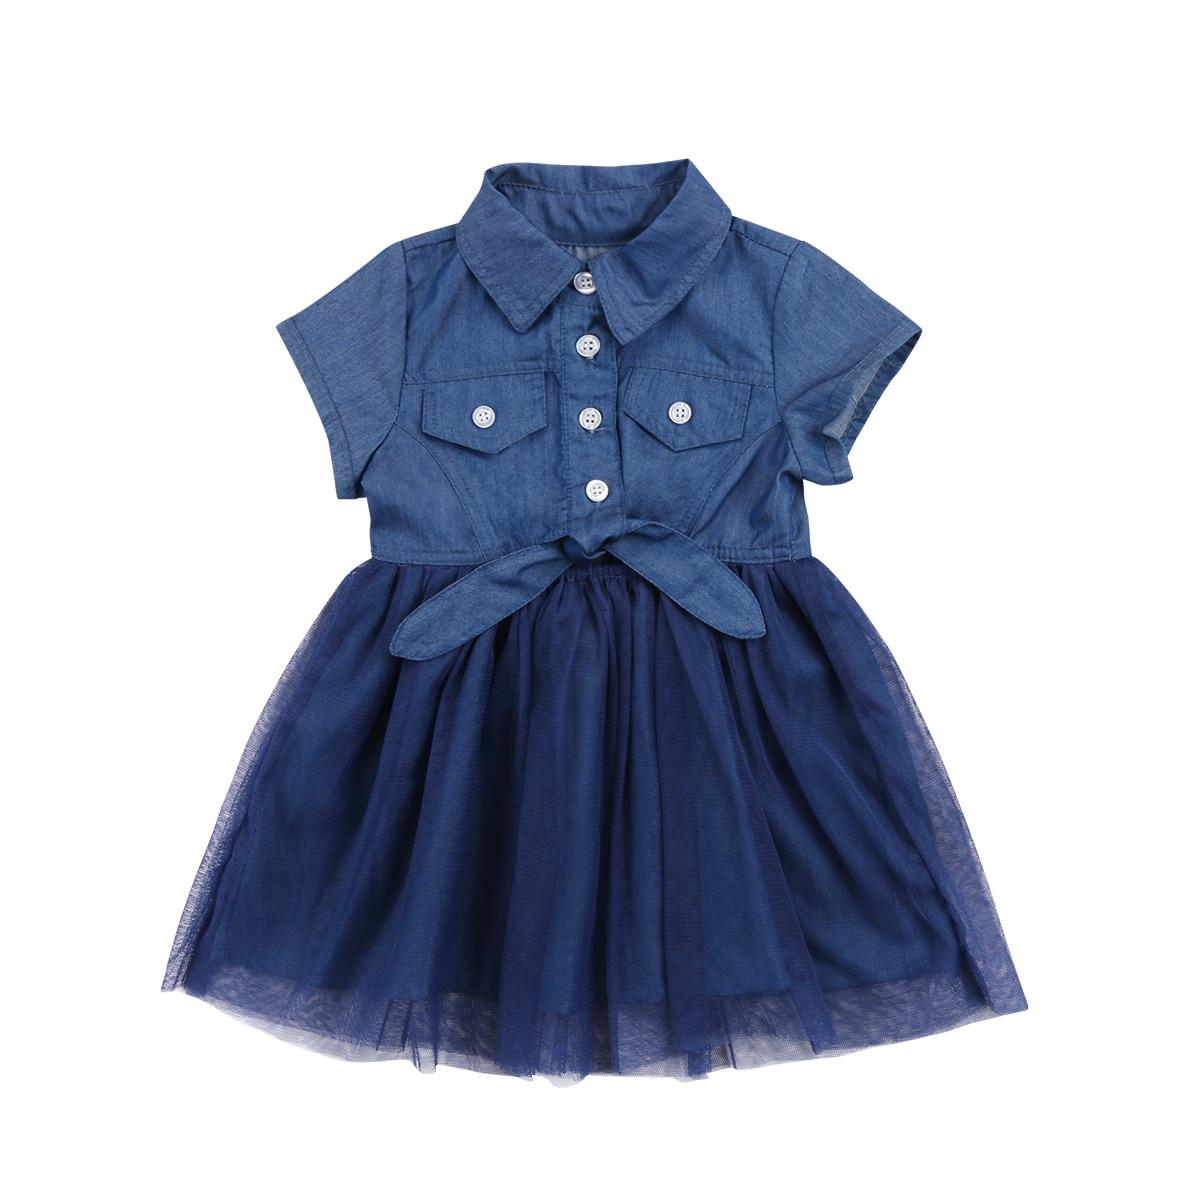 Cute Toddler Autumn Dress Kids Dress For Girl Denim Short Sleeve Ruffles Lace Tutu Dress 2-7TCute Toddler Autumn Dress Kids Dress For Girl Denim Short Sleeve Ruffles Lace Tutu Dress 2-7T